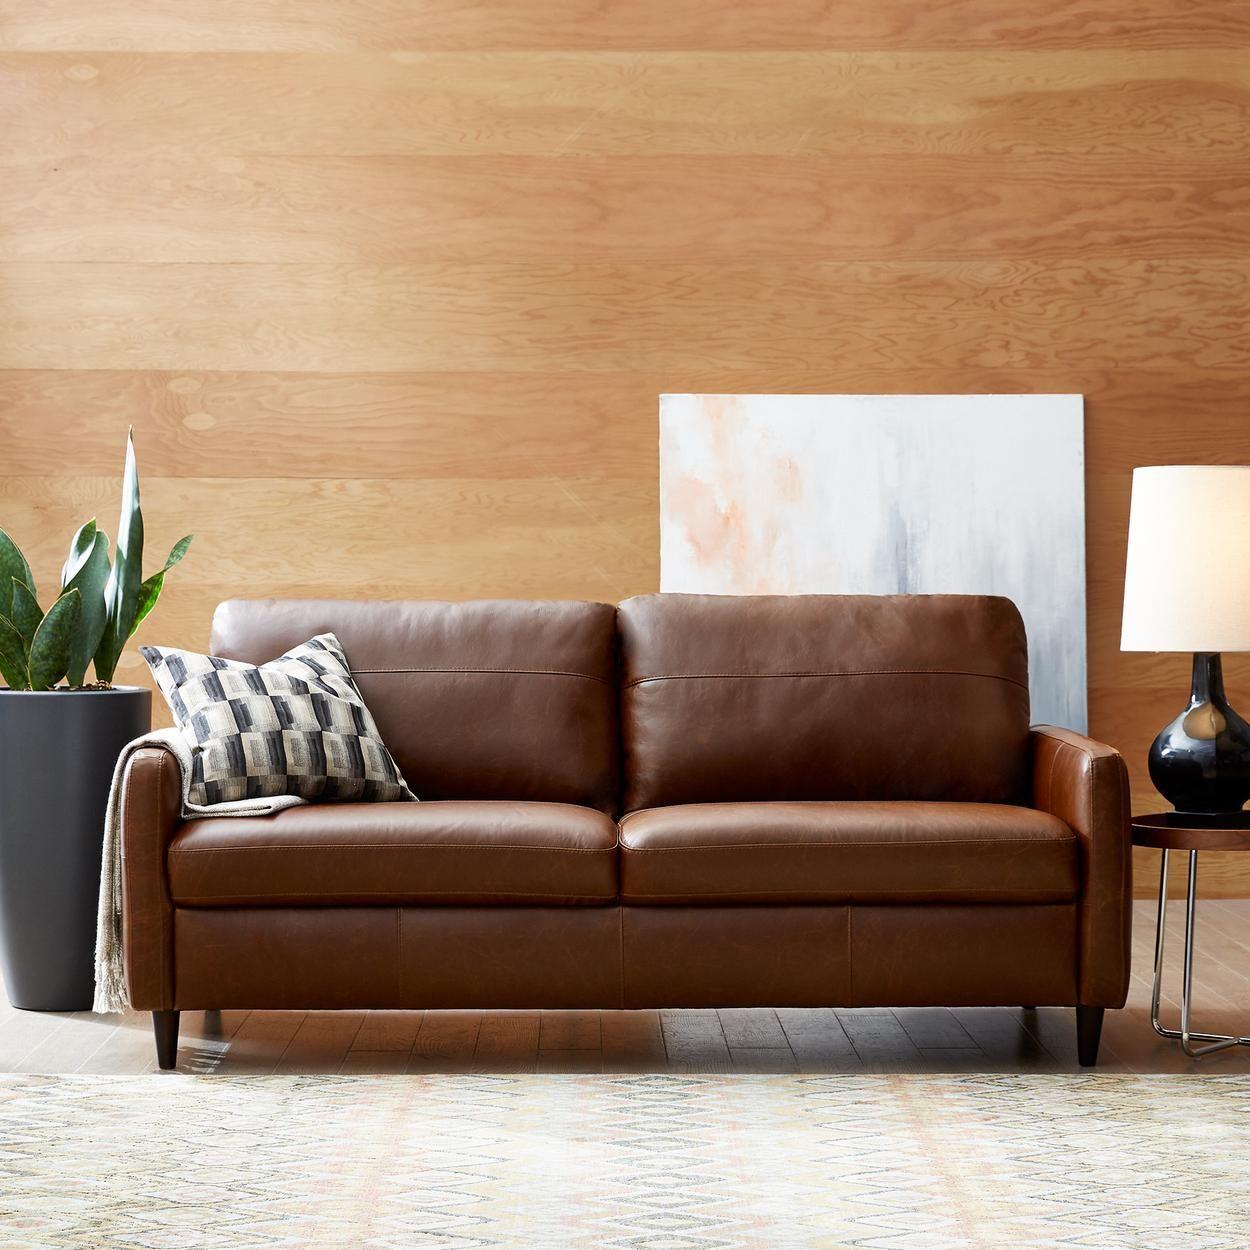 Buy alessa sofa online reviews sofa